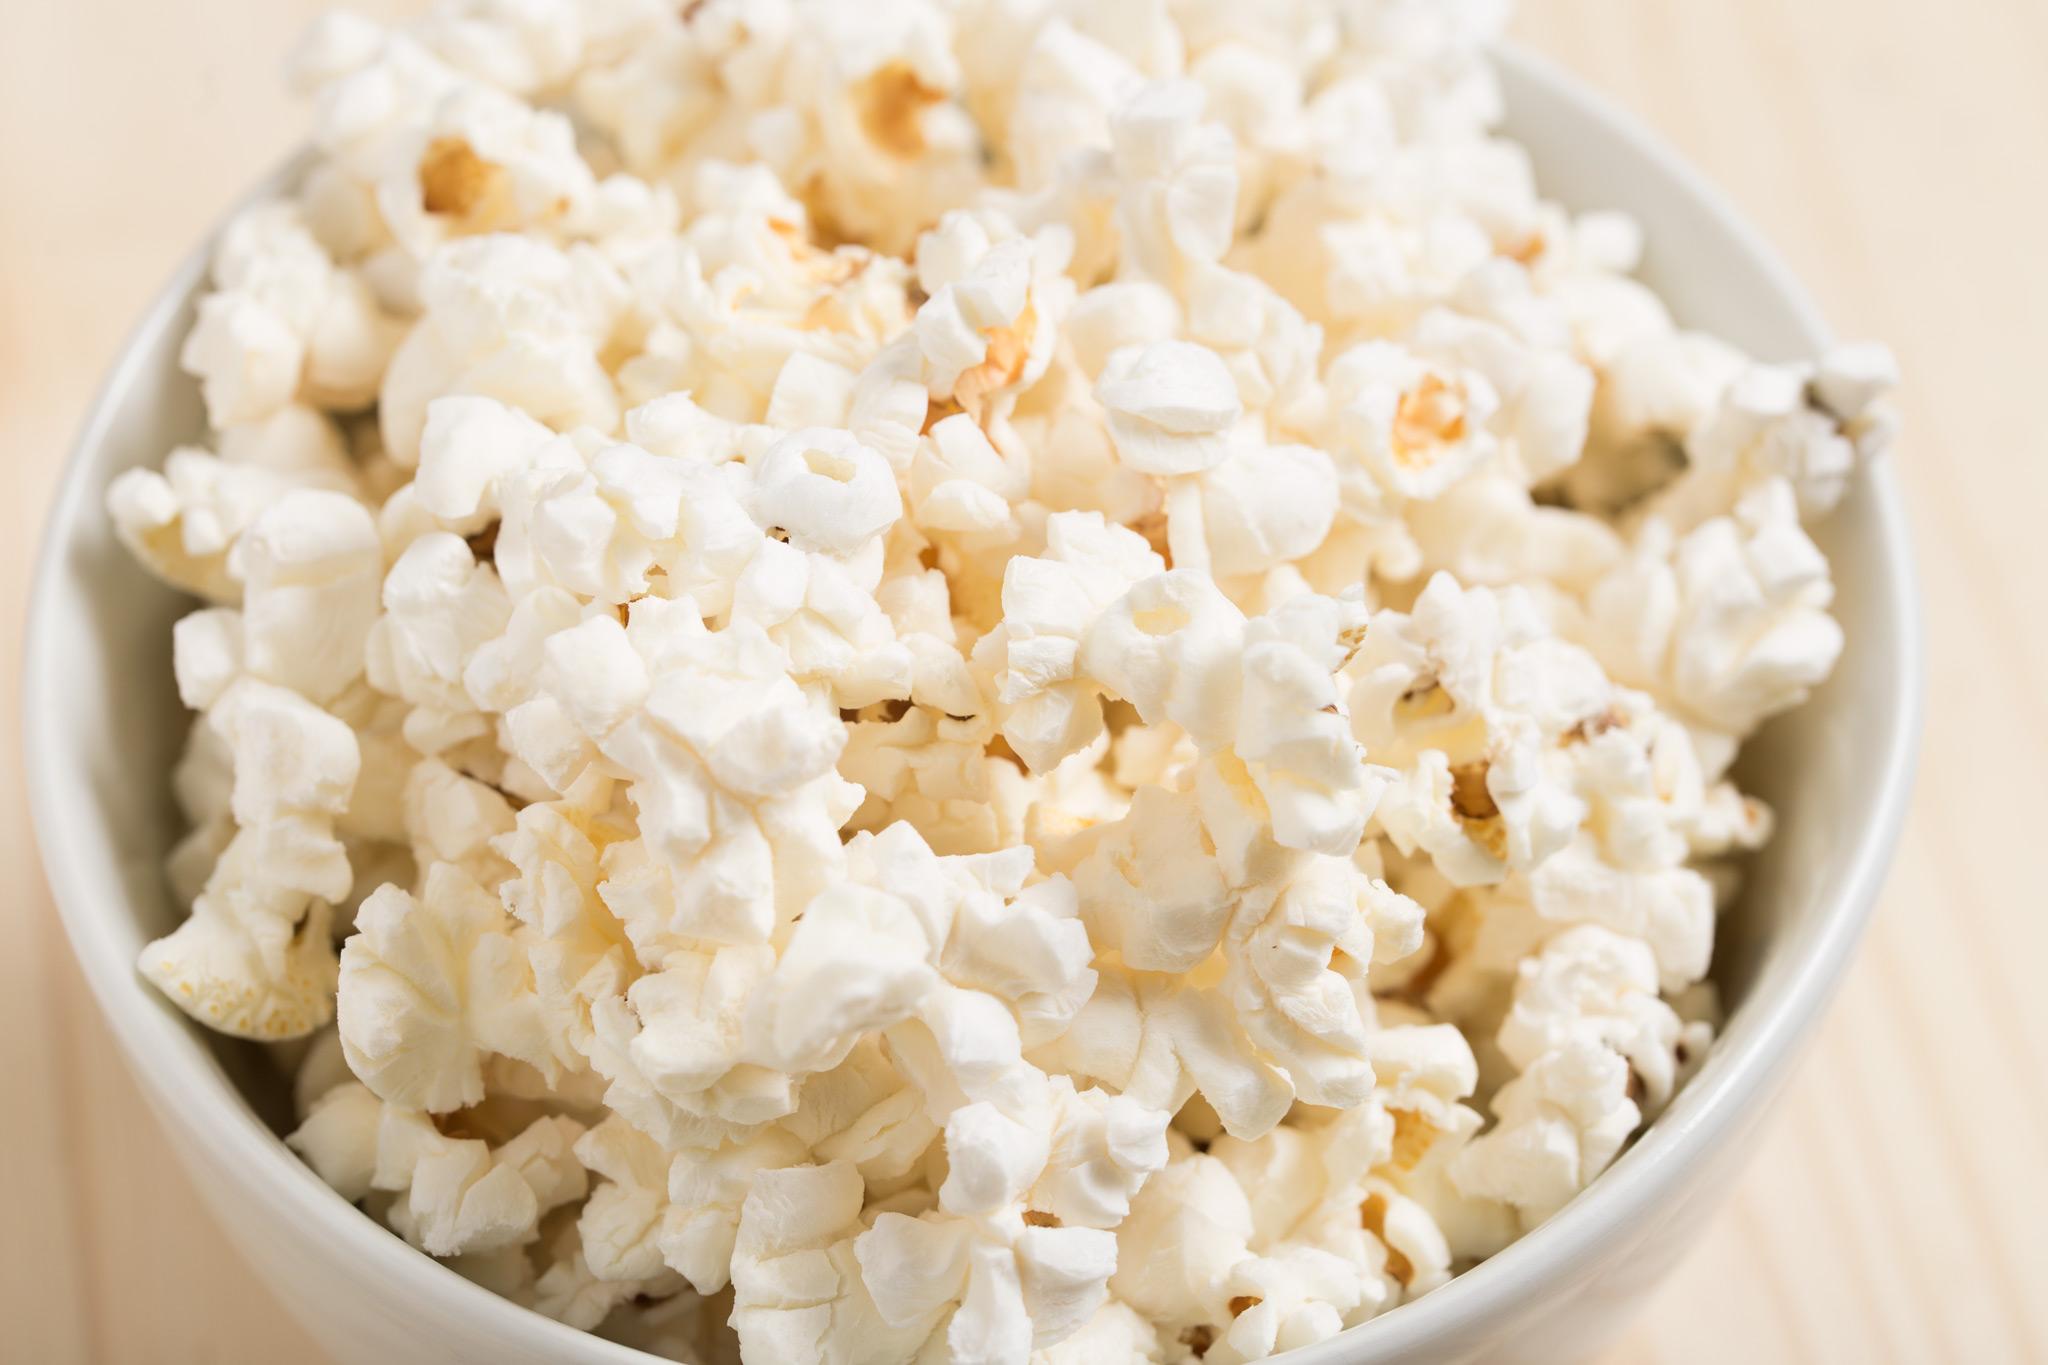 popcorn helps you poop